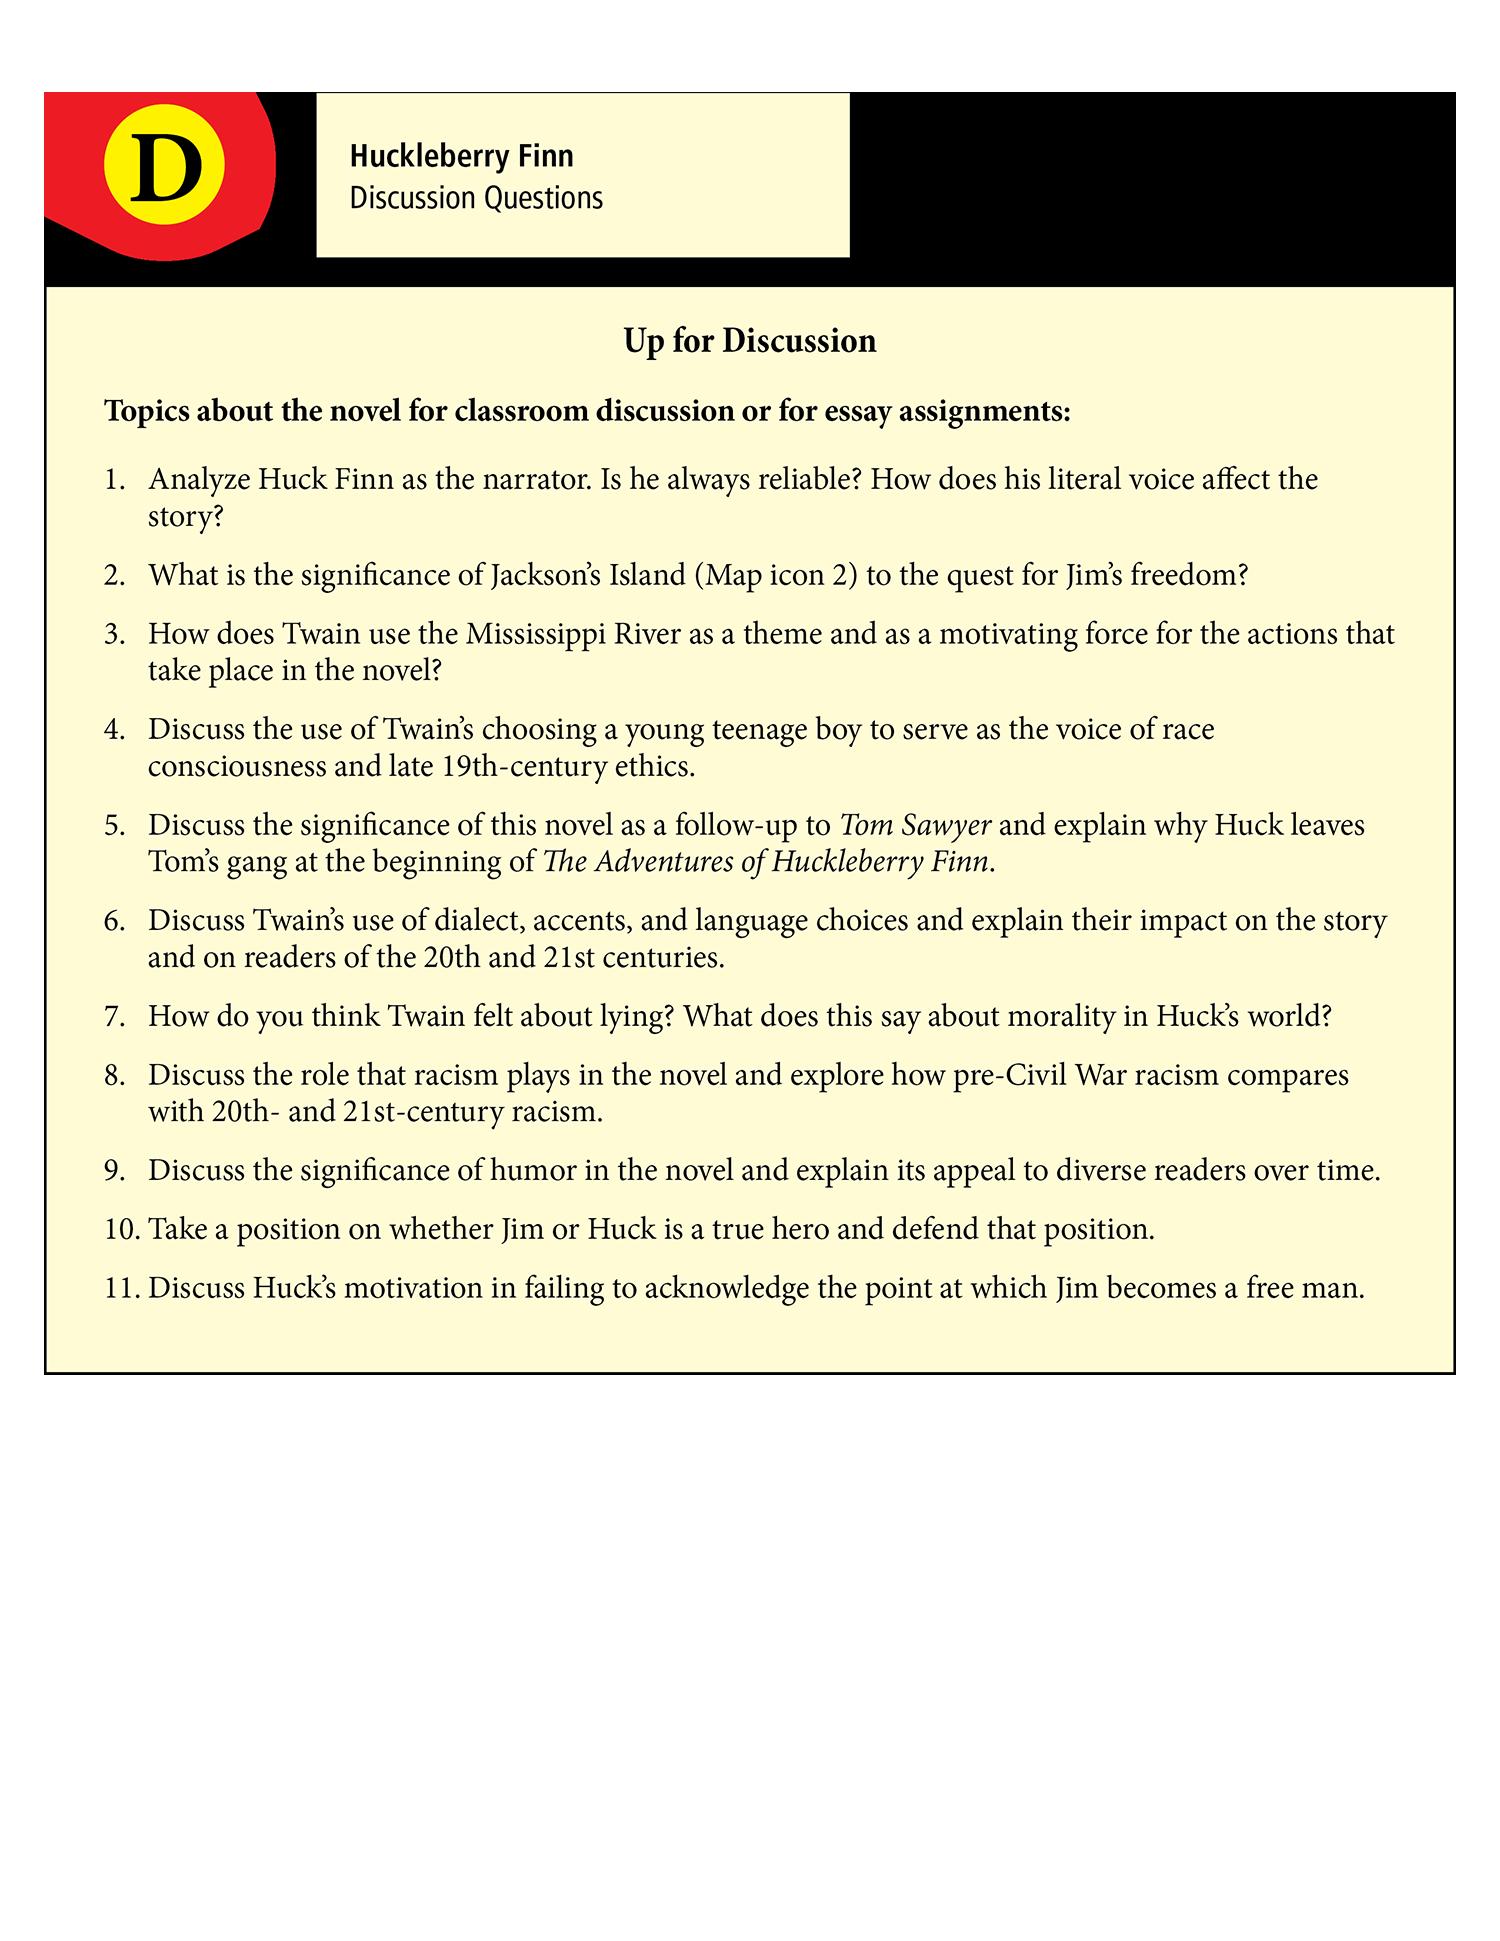 https://s3.amazonaws.com/bucket3grapes/Discussions+box+Huck3